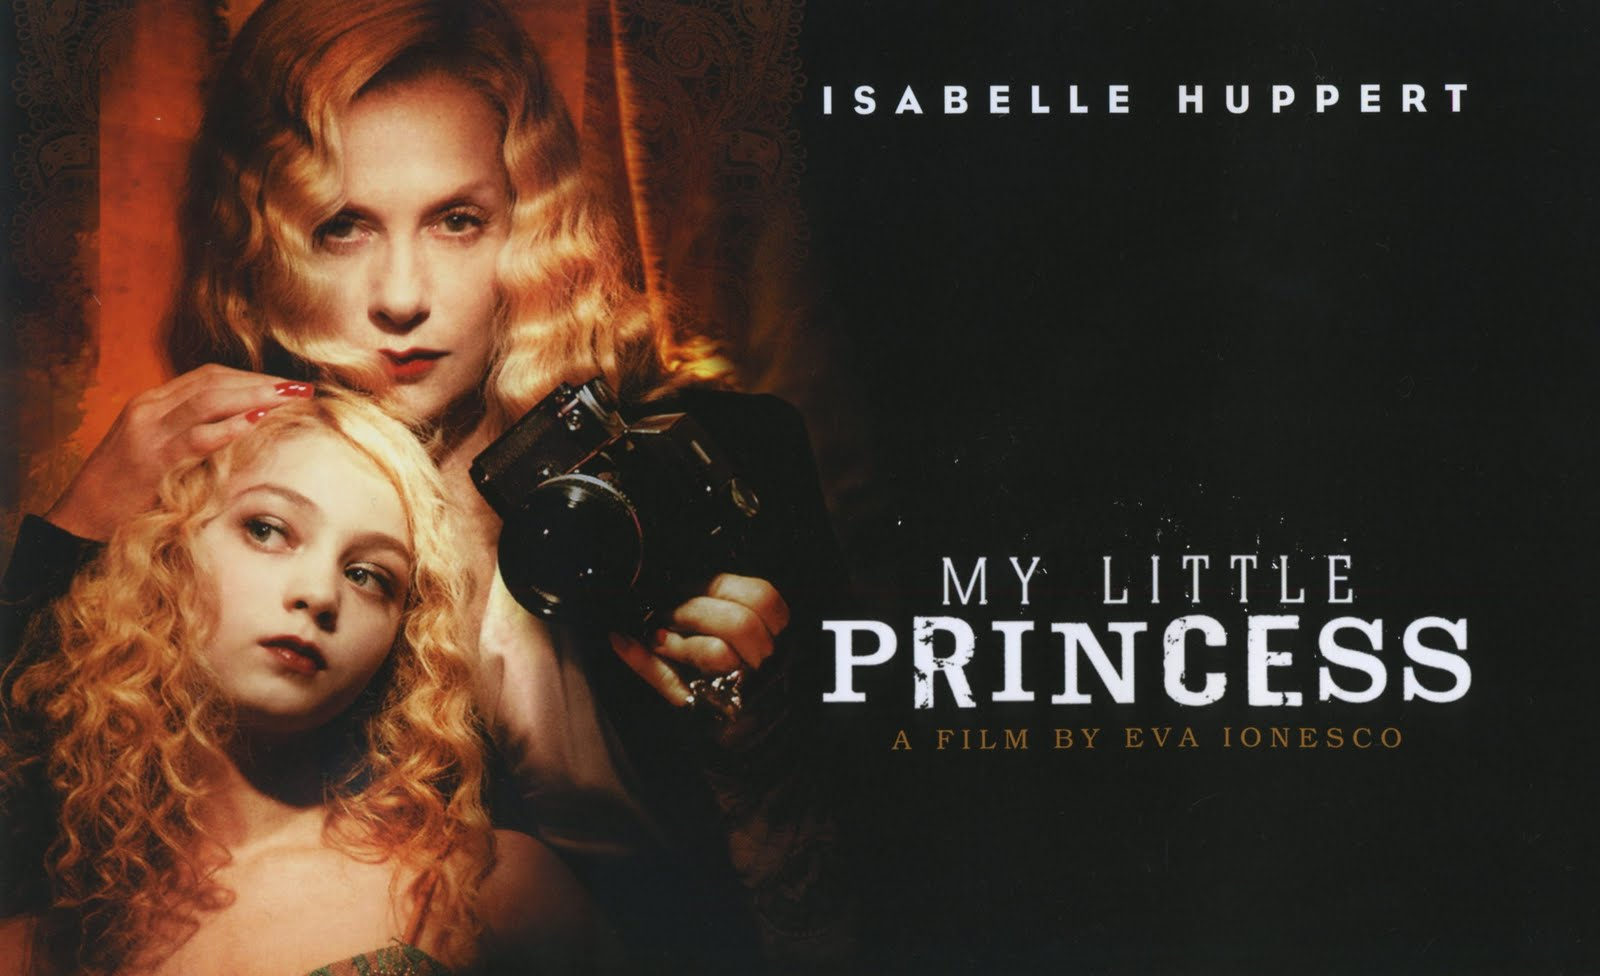 LYLYBYE: MOVIE MY LITTLE PRINCESS - EVA IONESCO - ISABELLE